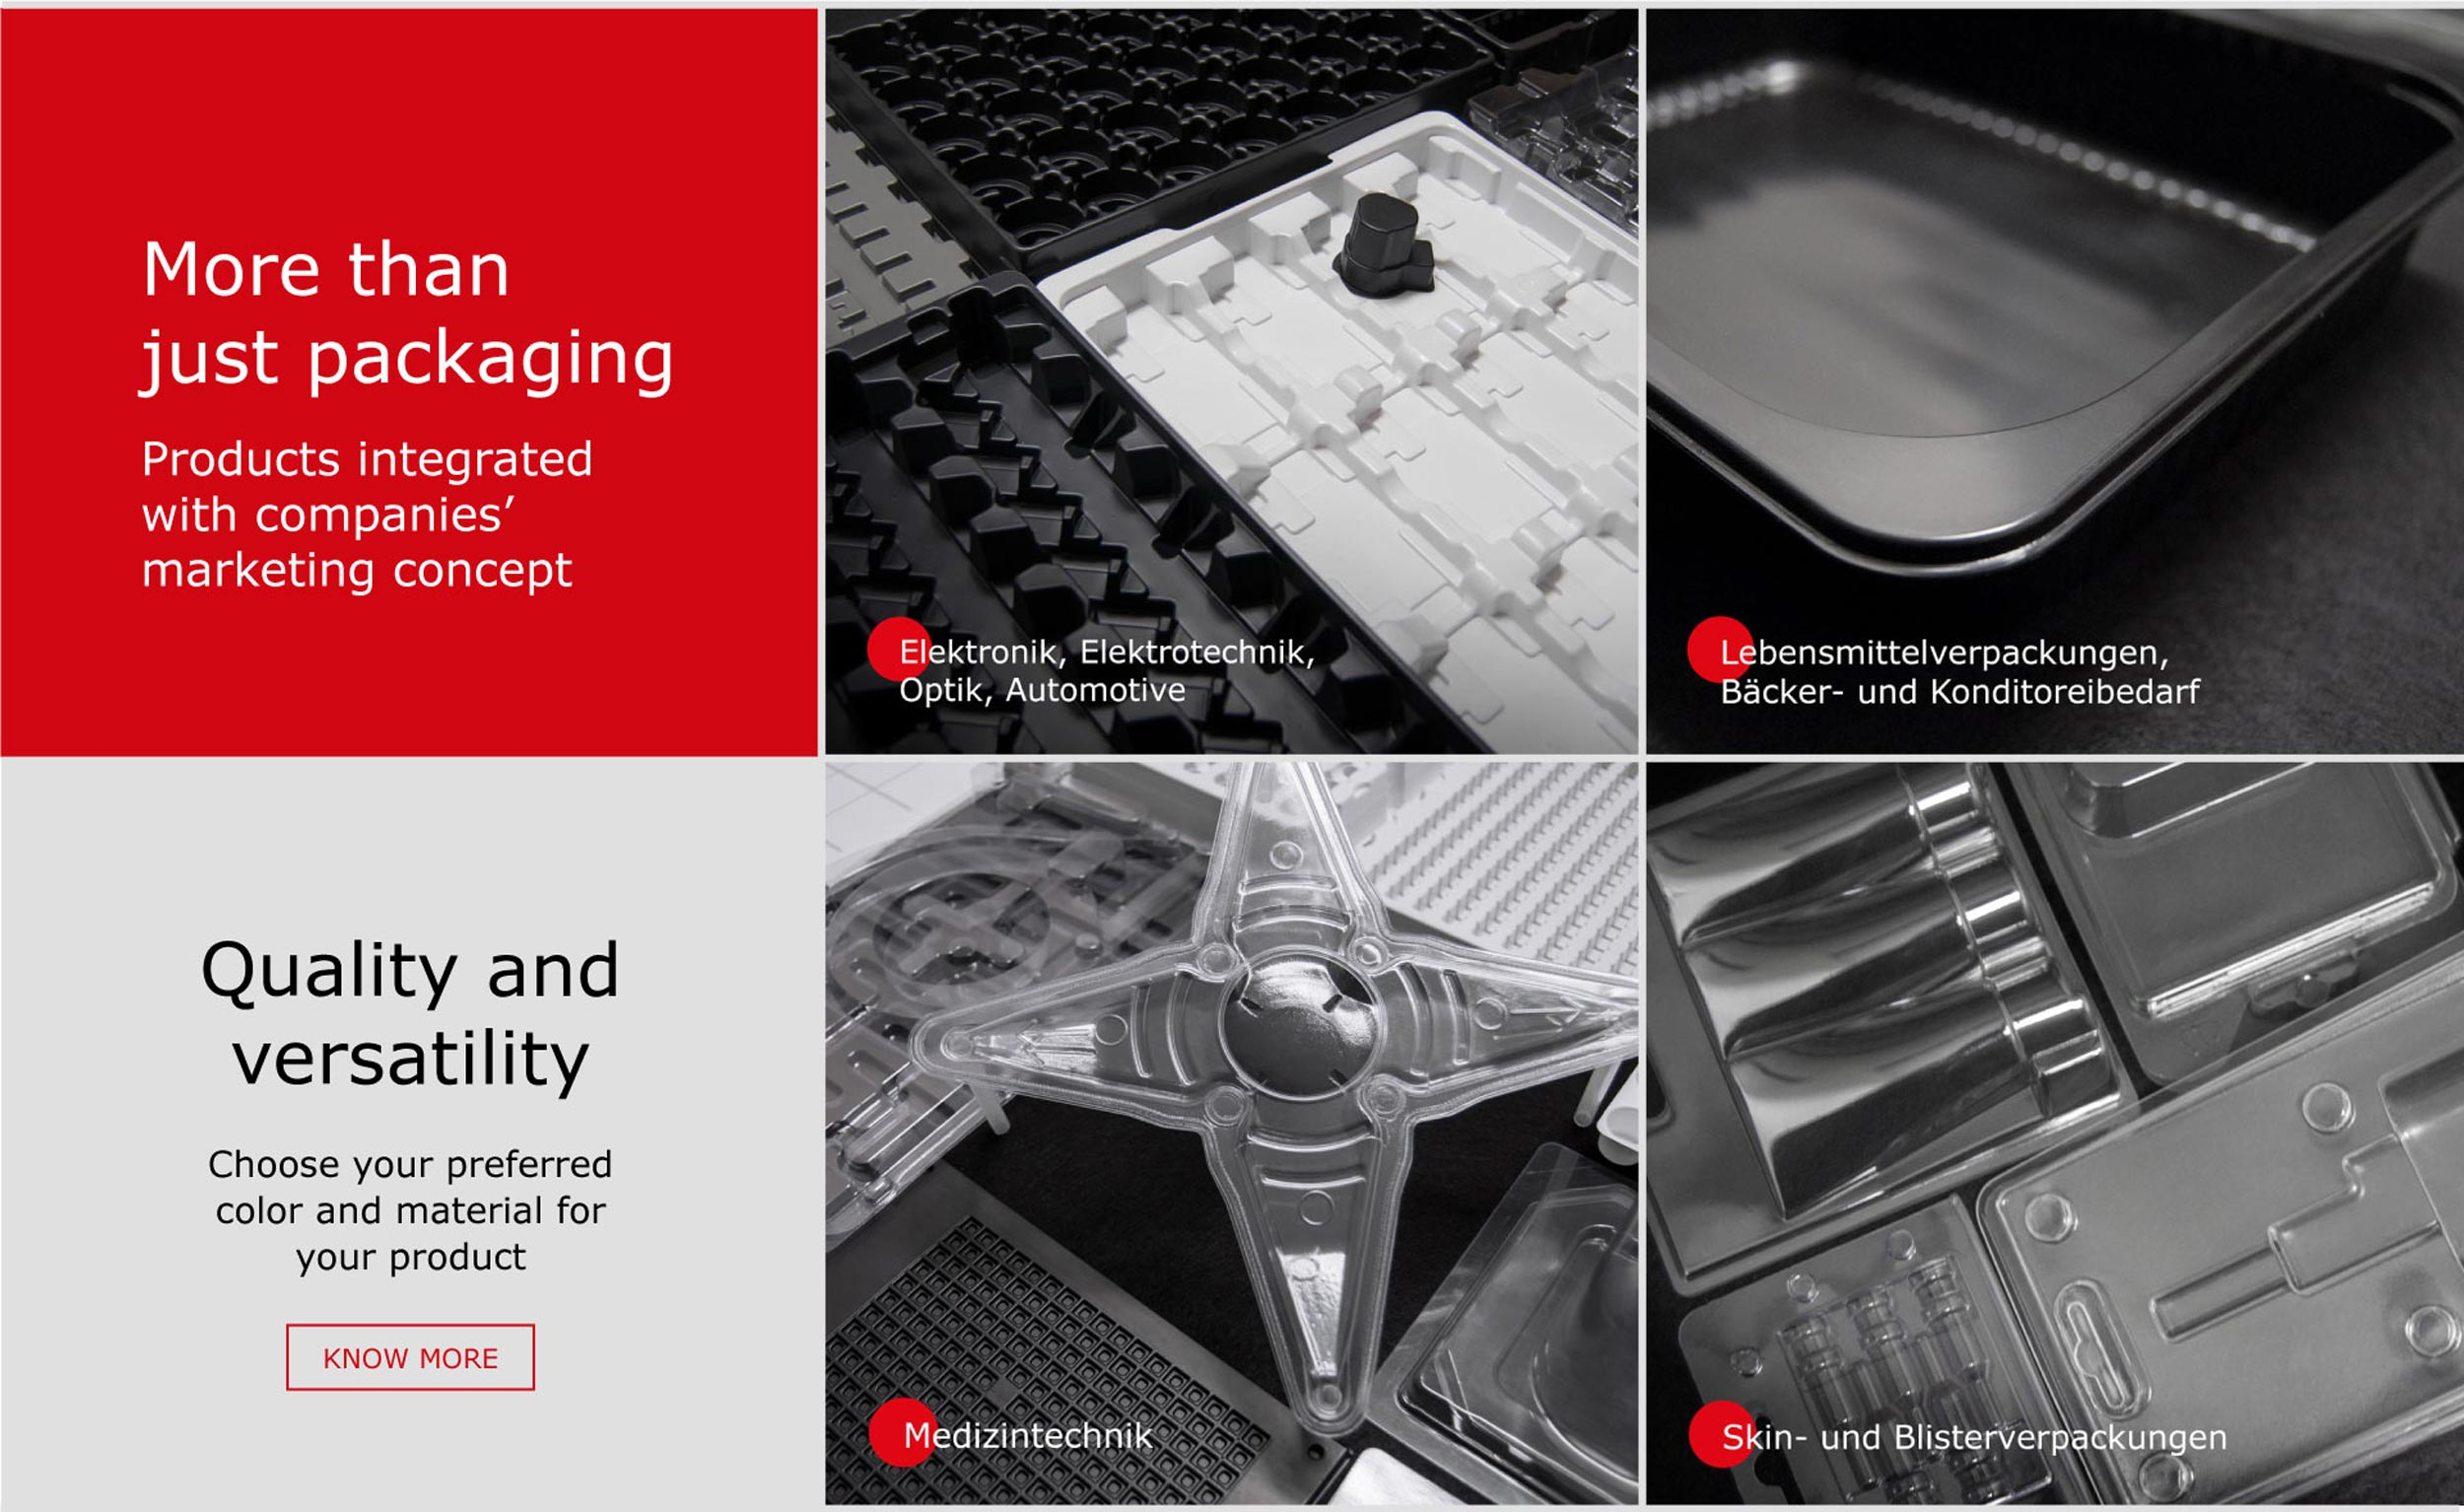 Creative-Verpackungen-website-products-GPU-Design